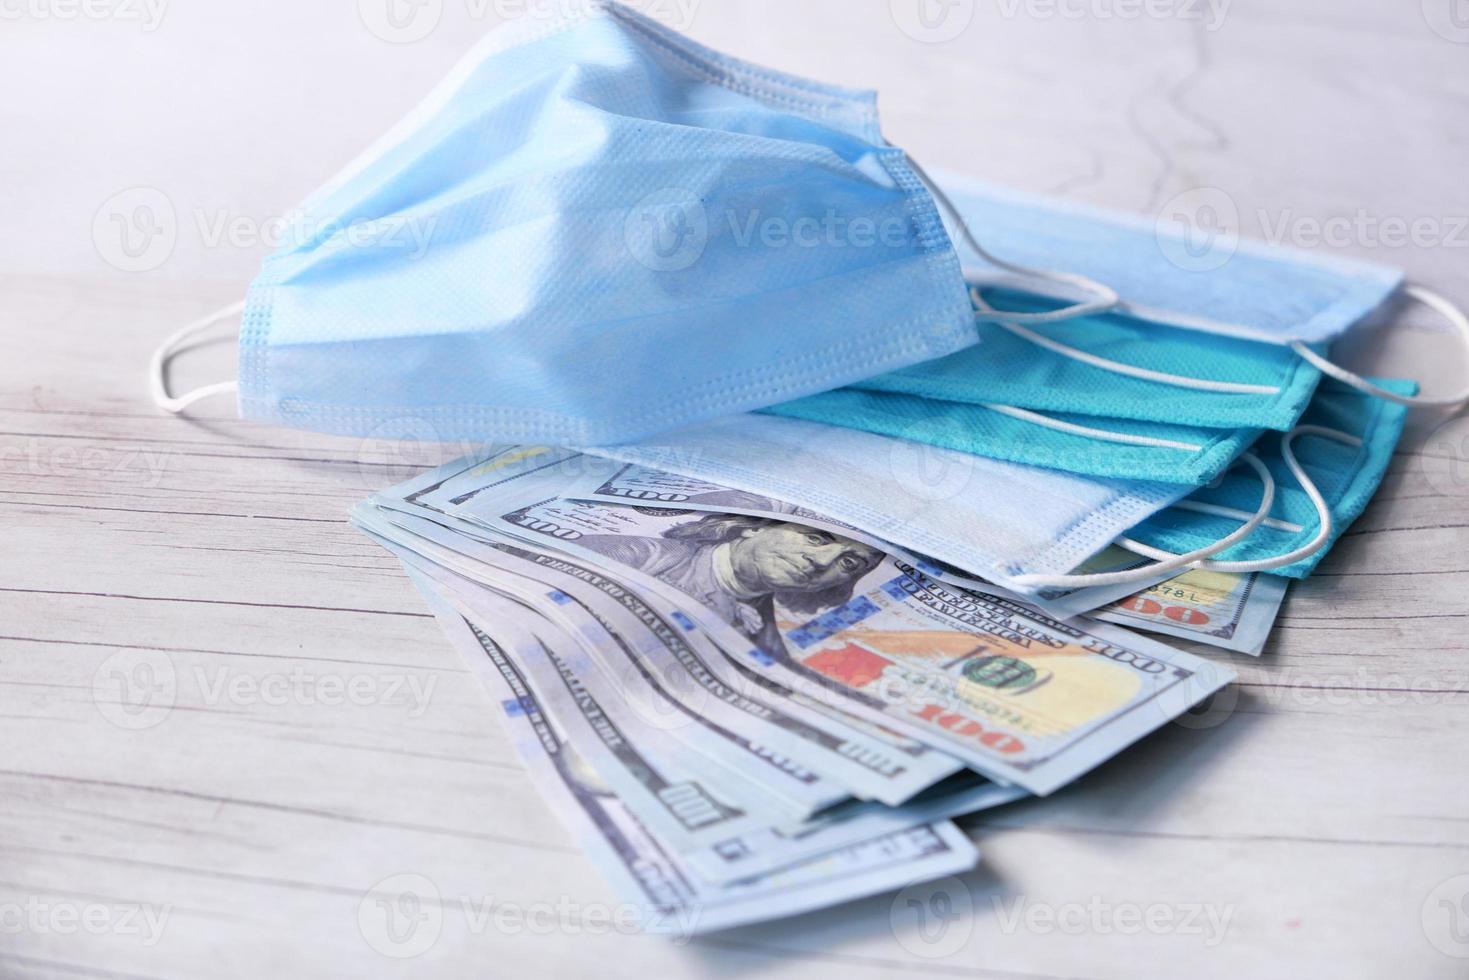 us dollars en wegwerp gezichtsmaskers op tafel foto